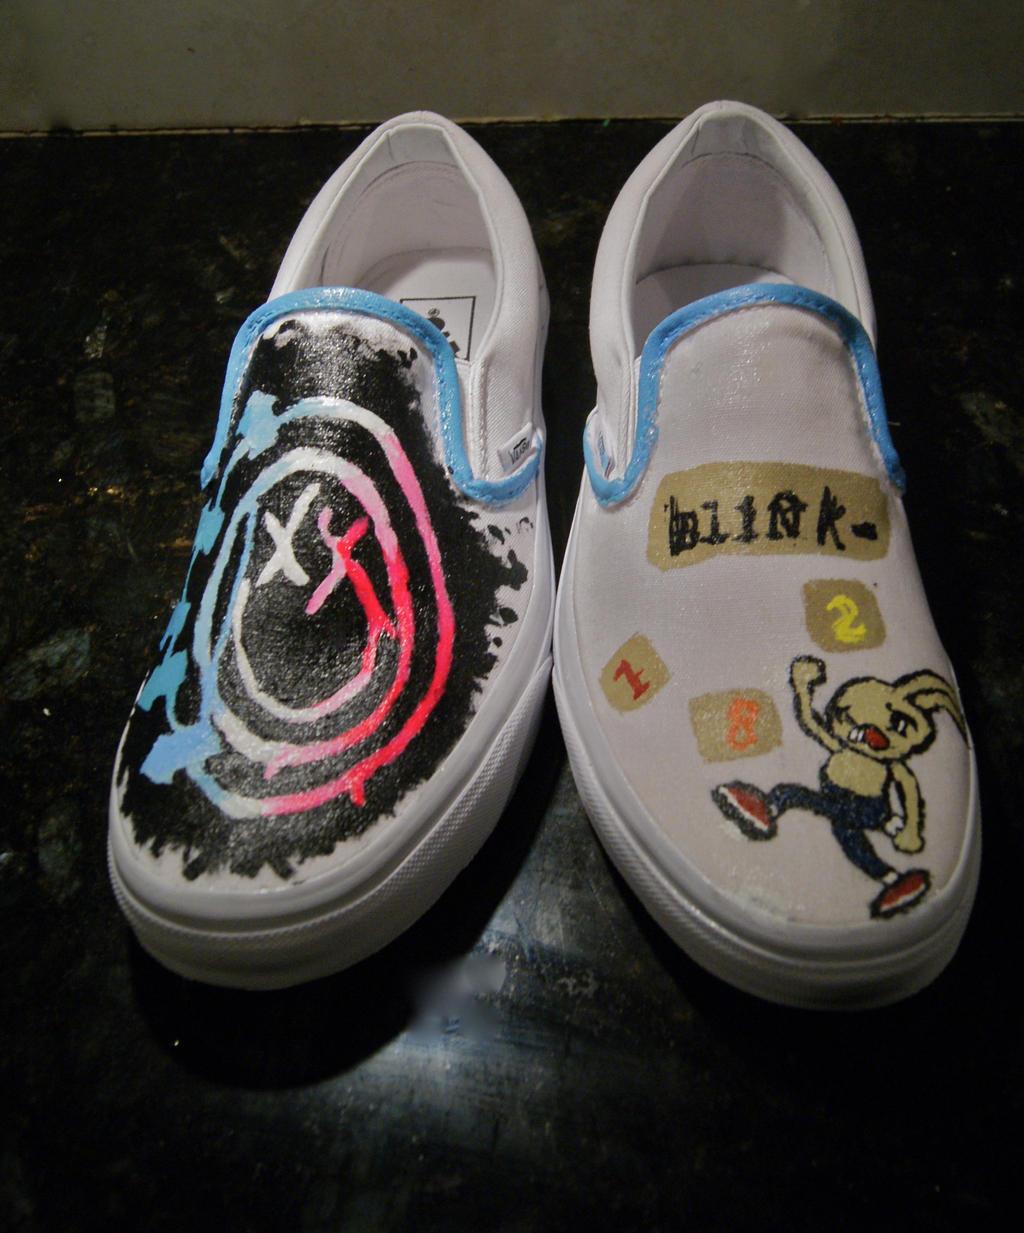 comprar mejor Venta de descuento 2019 lujo Blink-182-Vans by Arie-Vampiress on DeviantArt